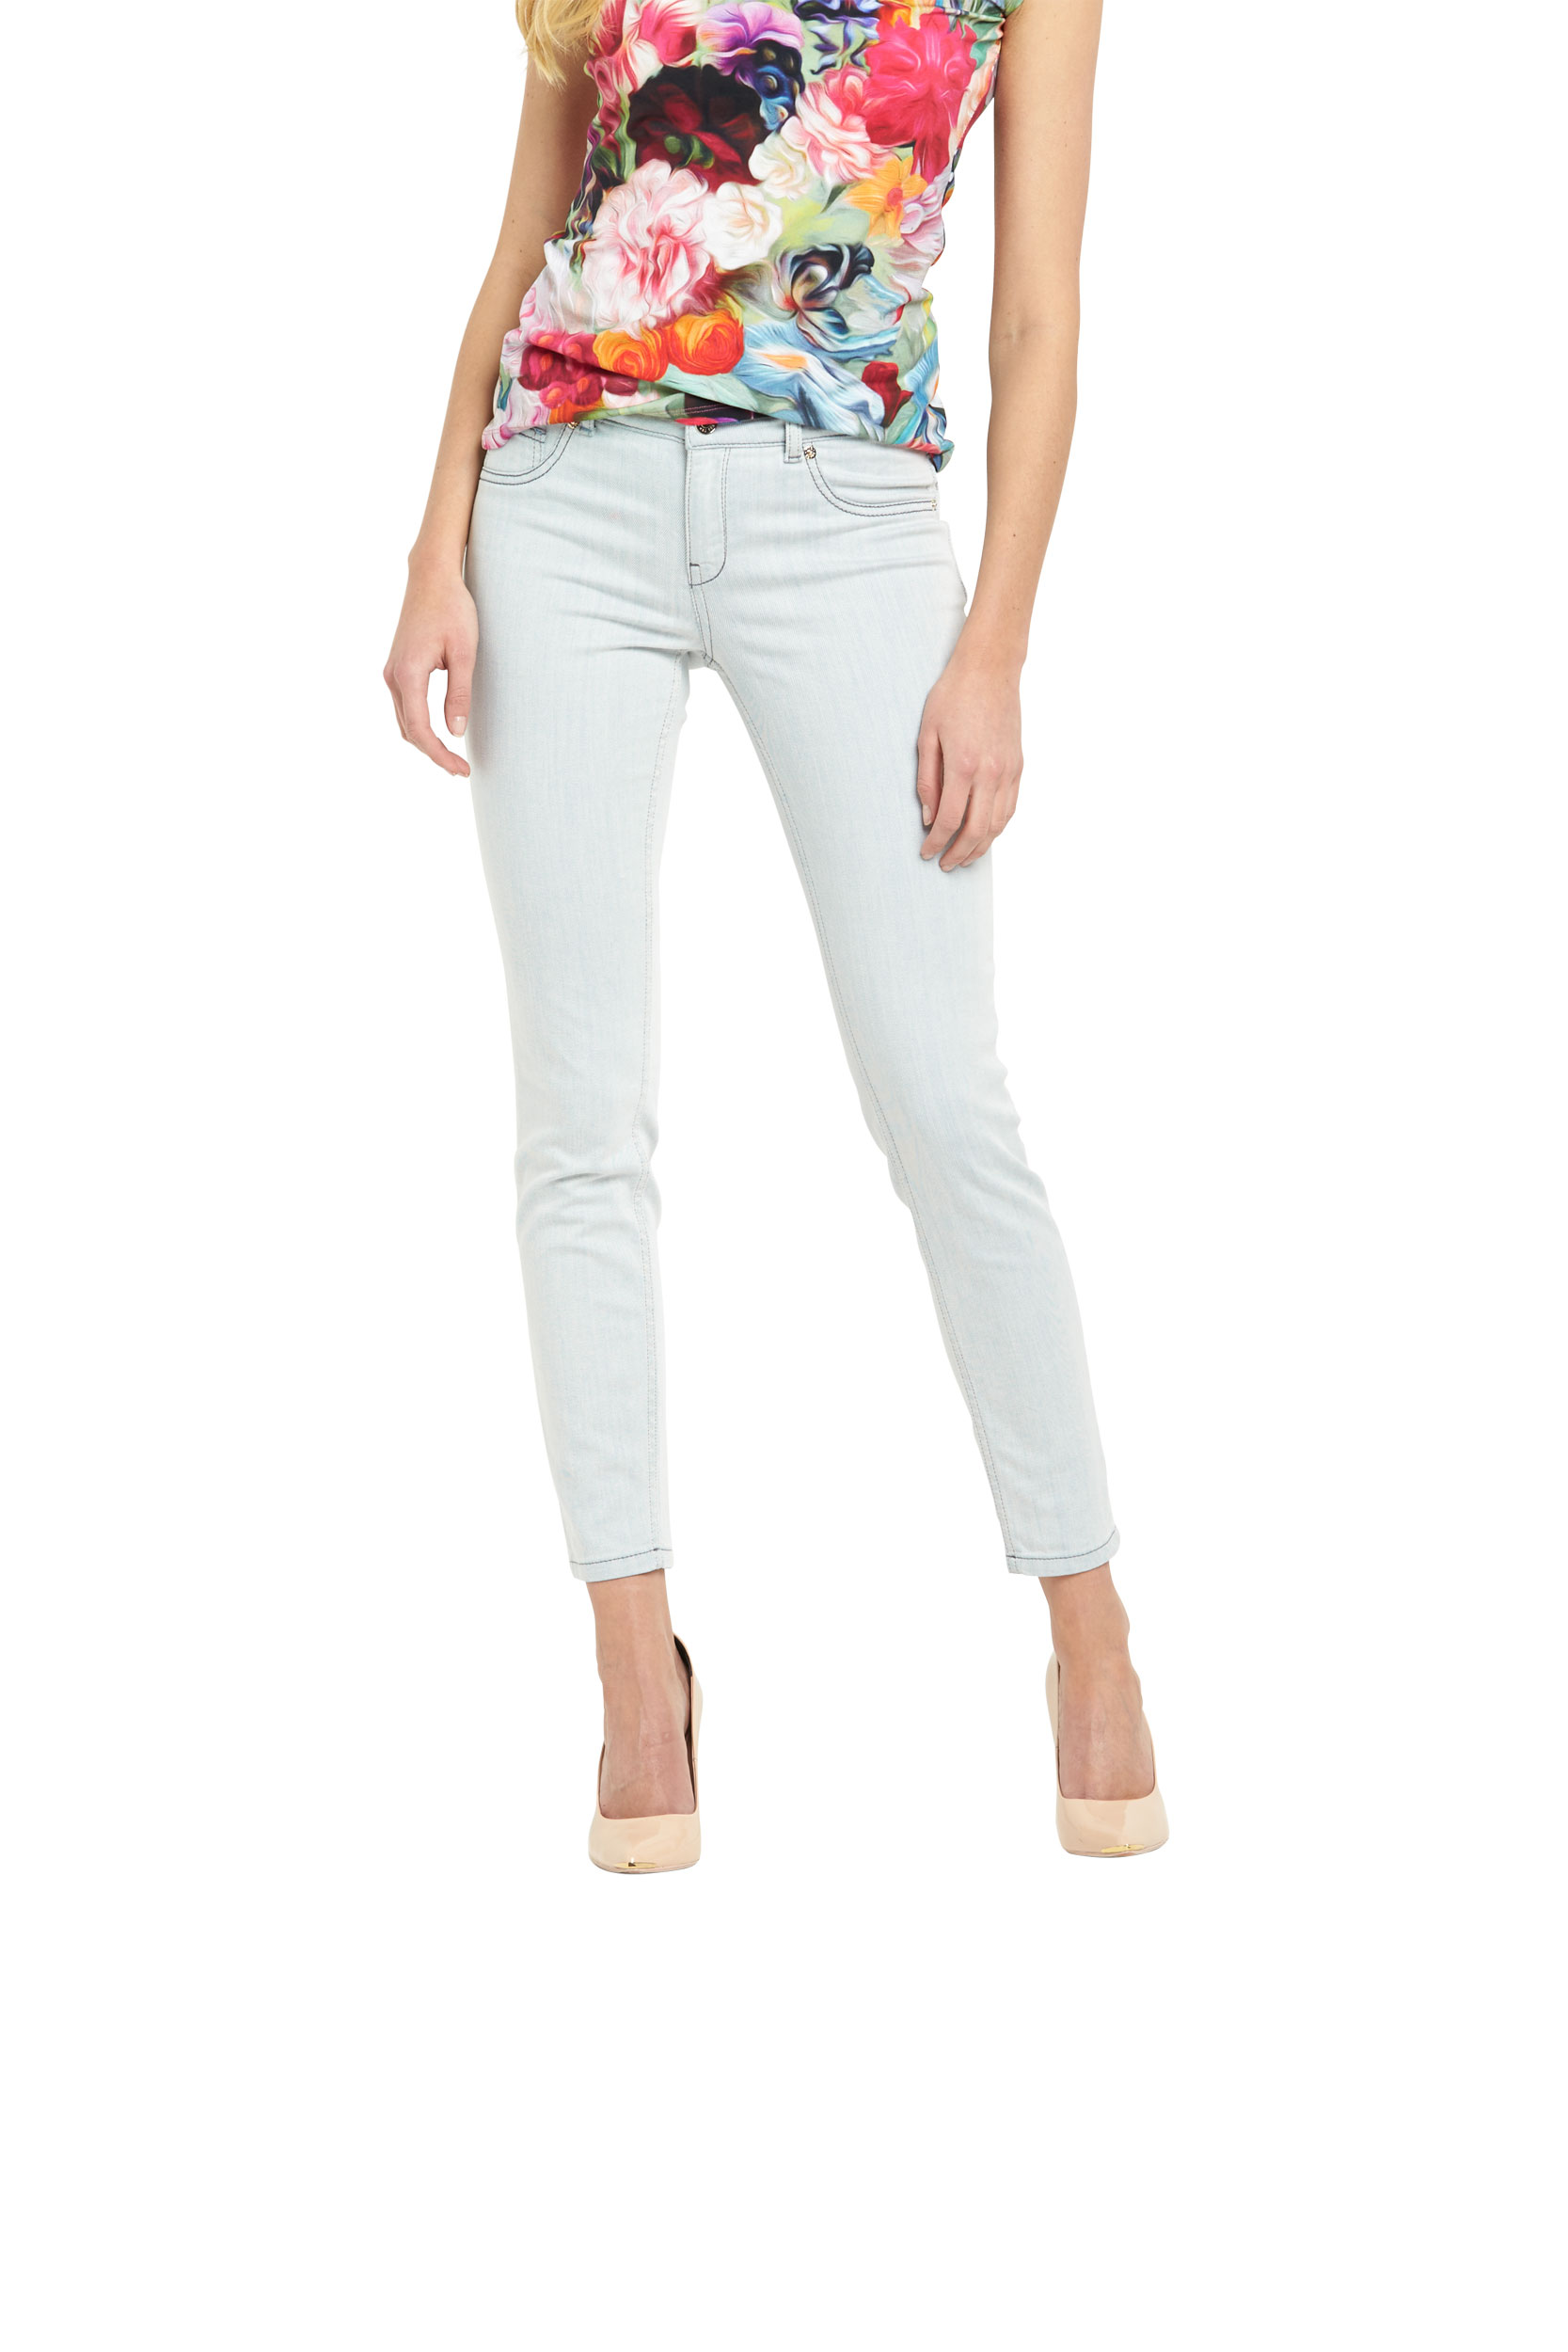 Ted Baker Skinny Pale Turn Up Denim Jeans